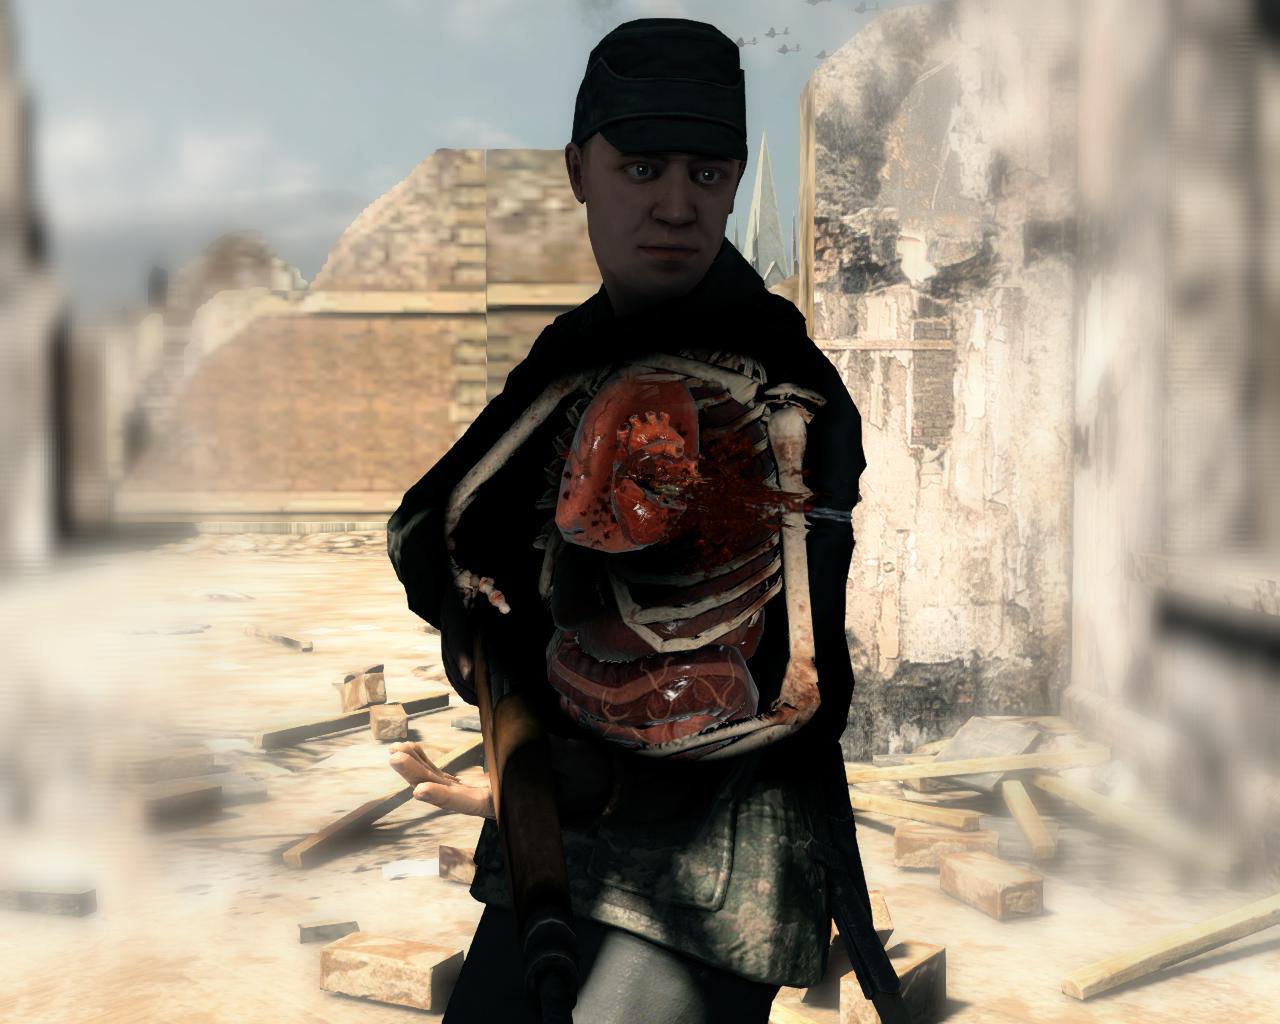 jeuxvideo.com Sniper Elite V2 - PC Image 12 sur 34